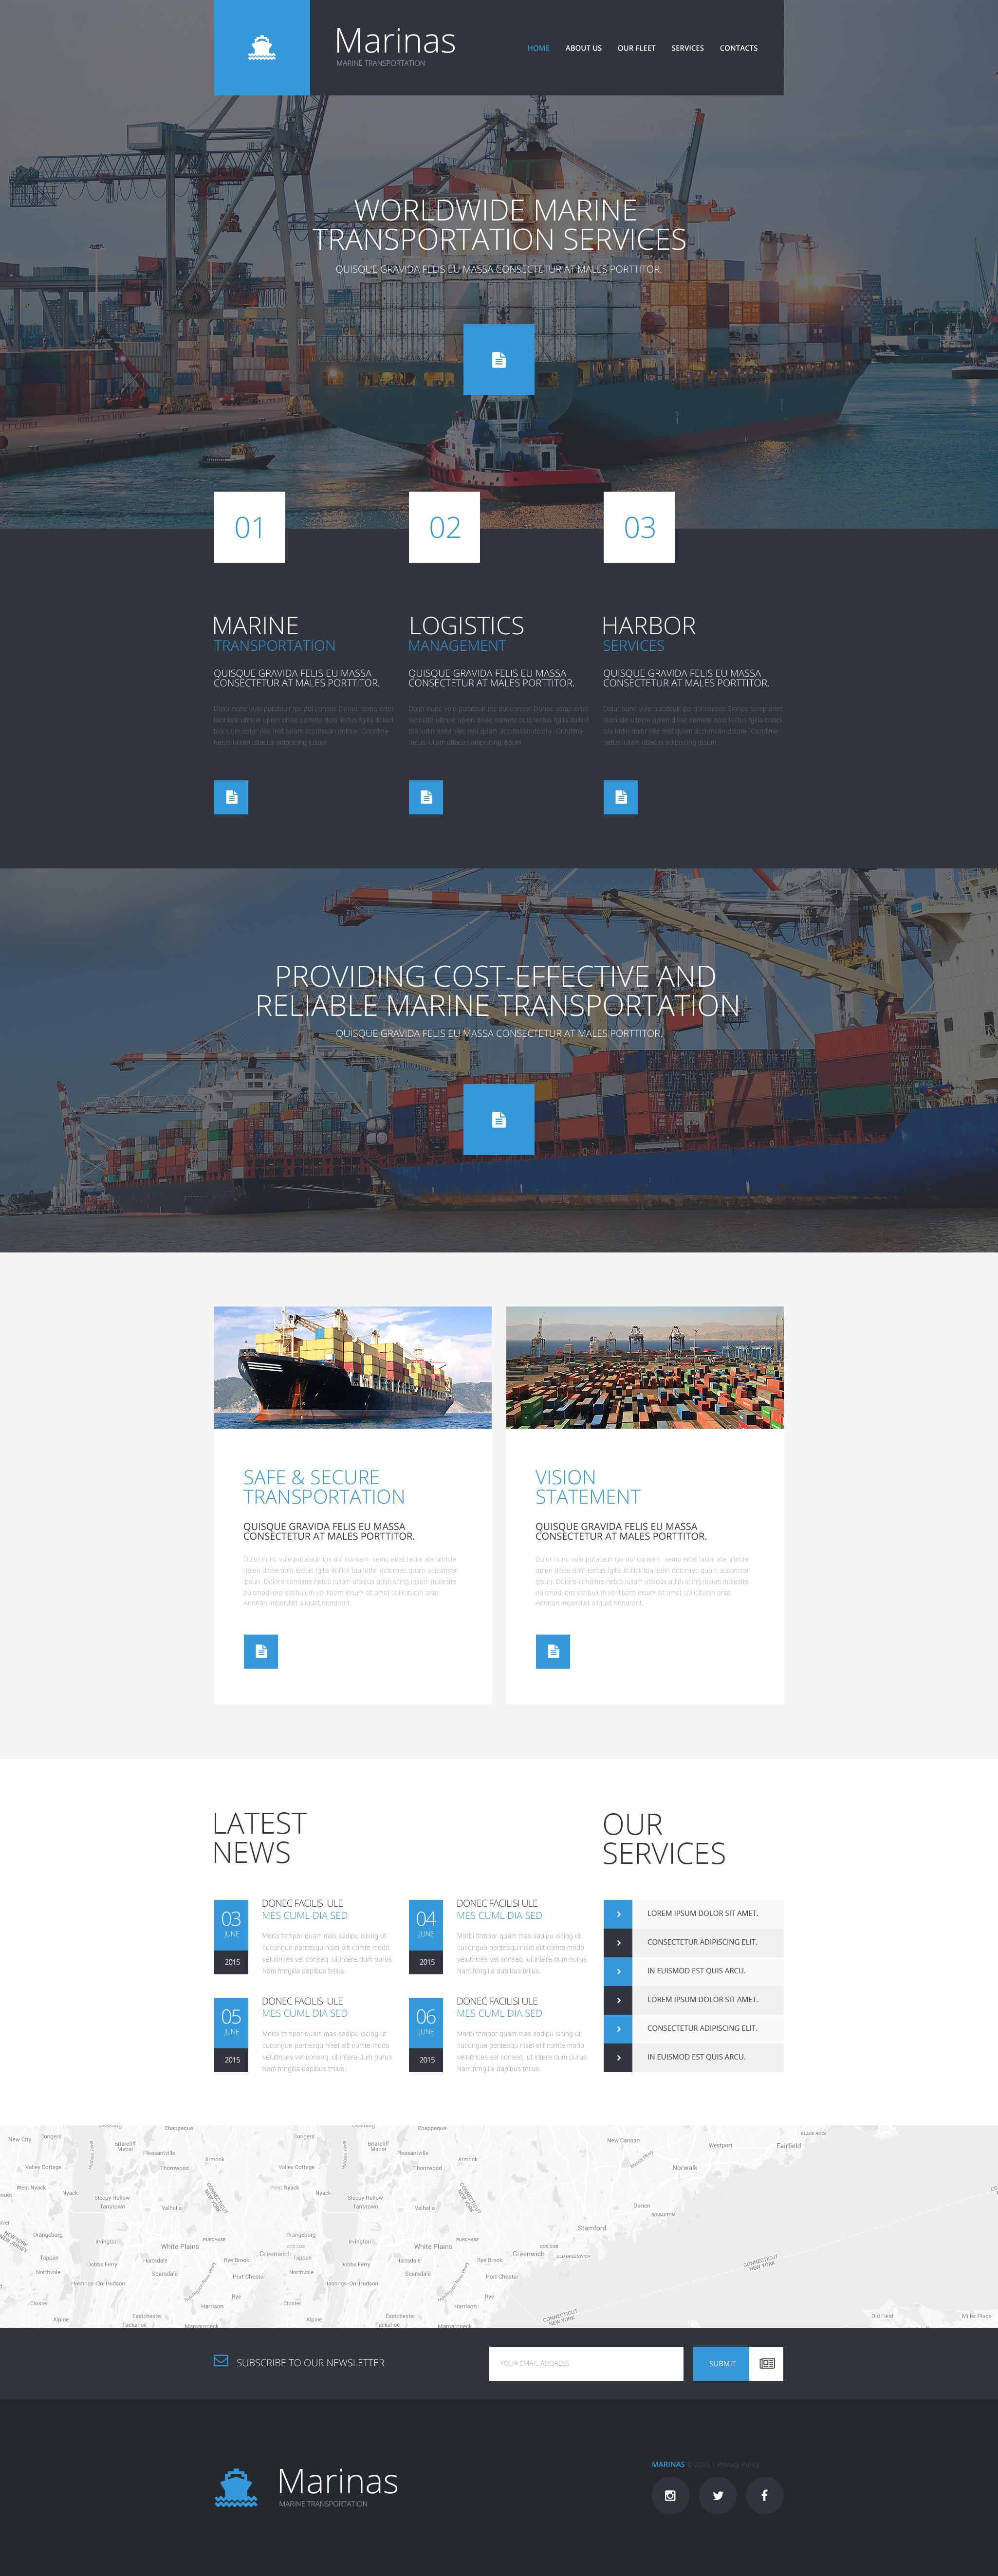 Maritime Responsive Website Template - screenshot